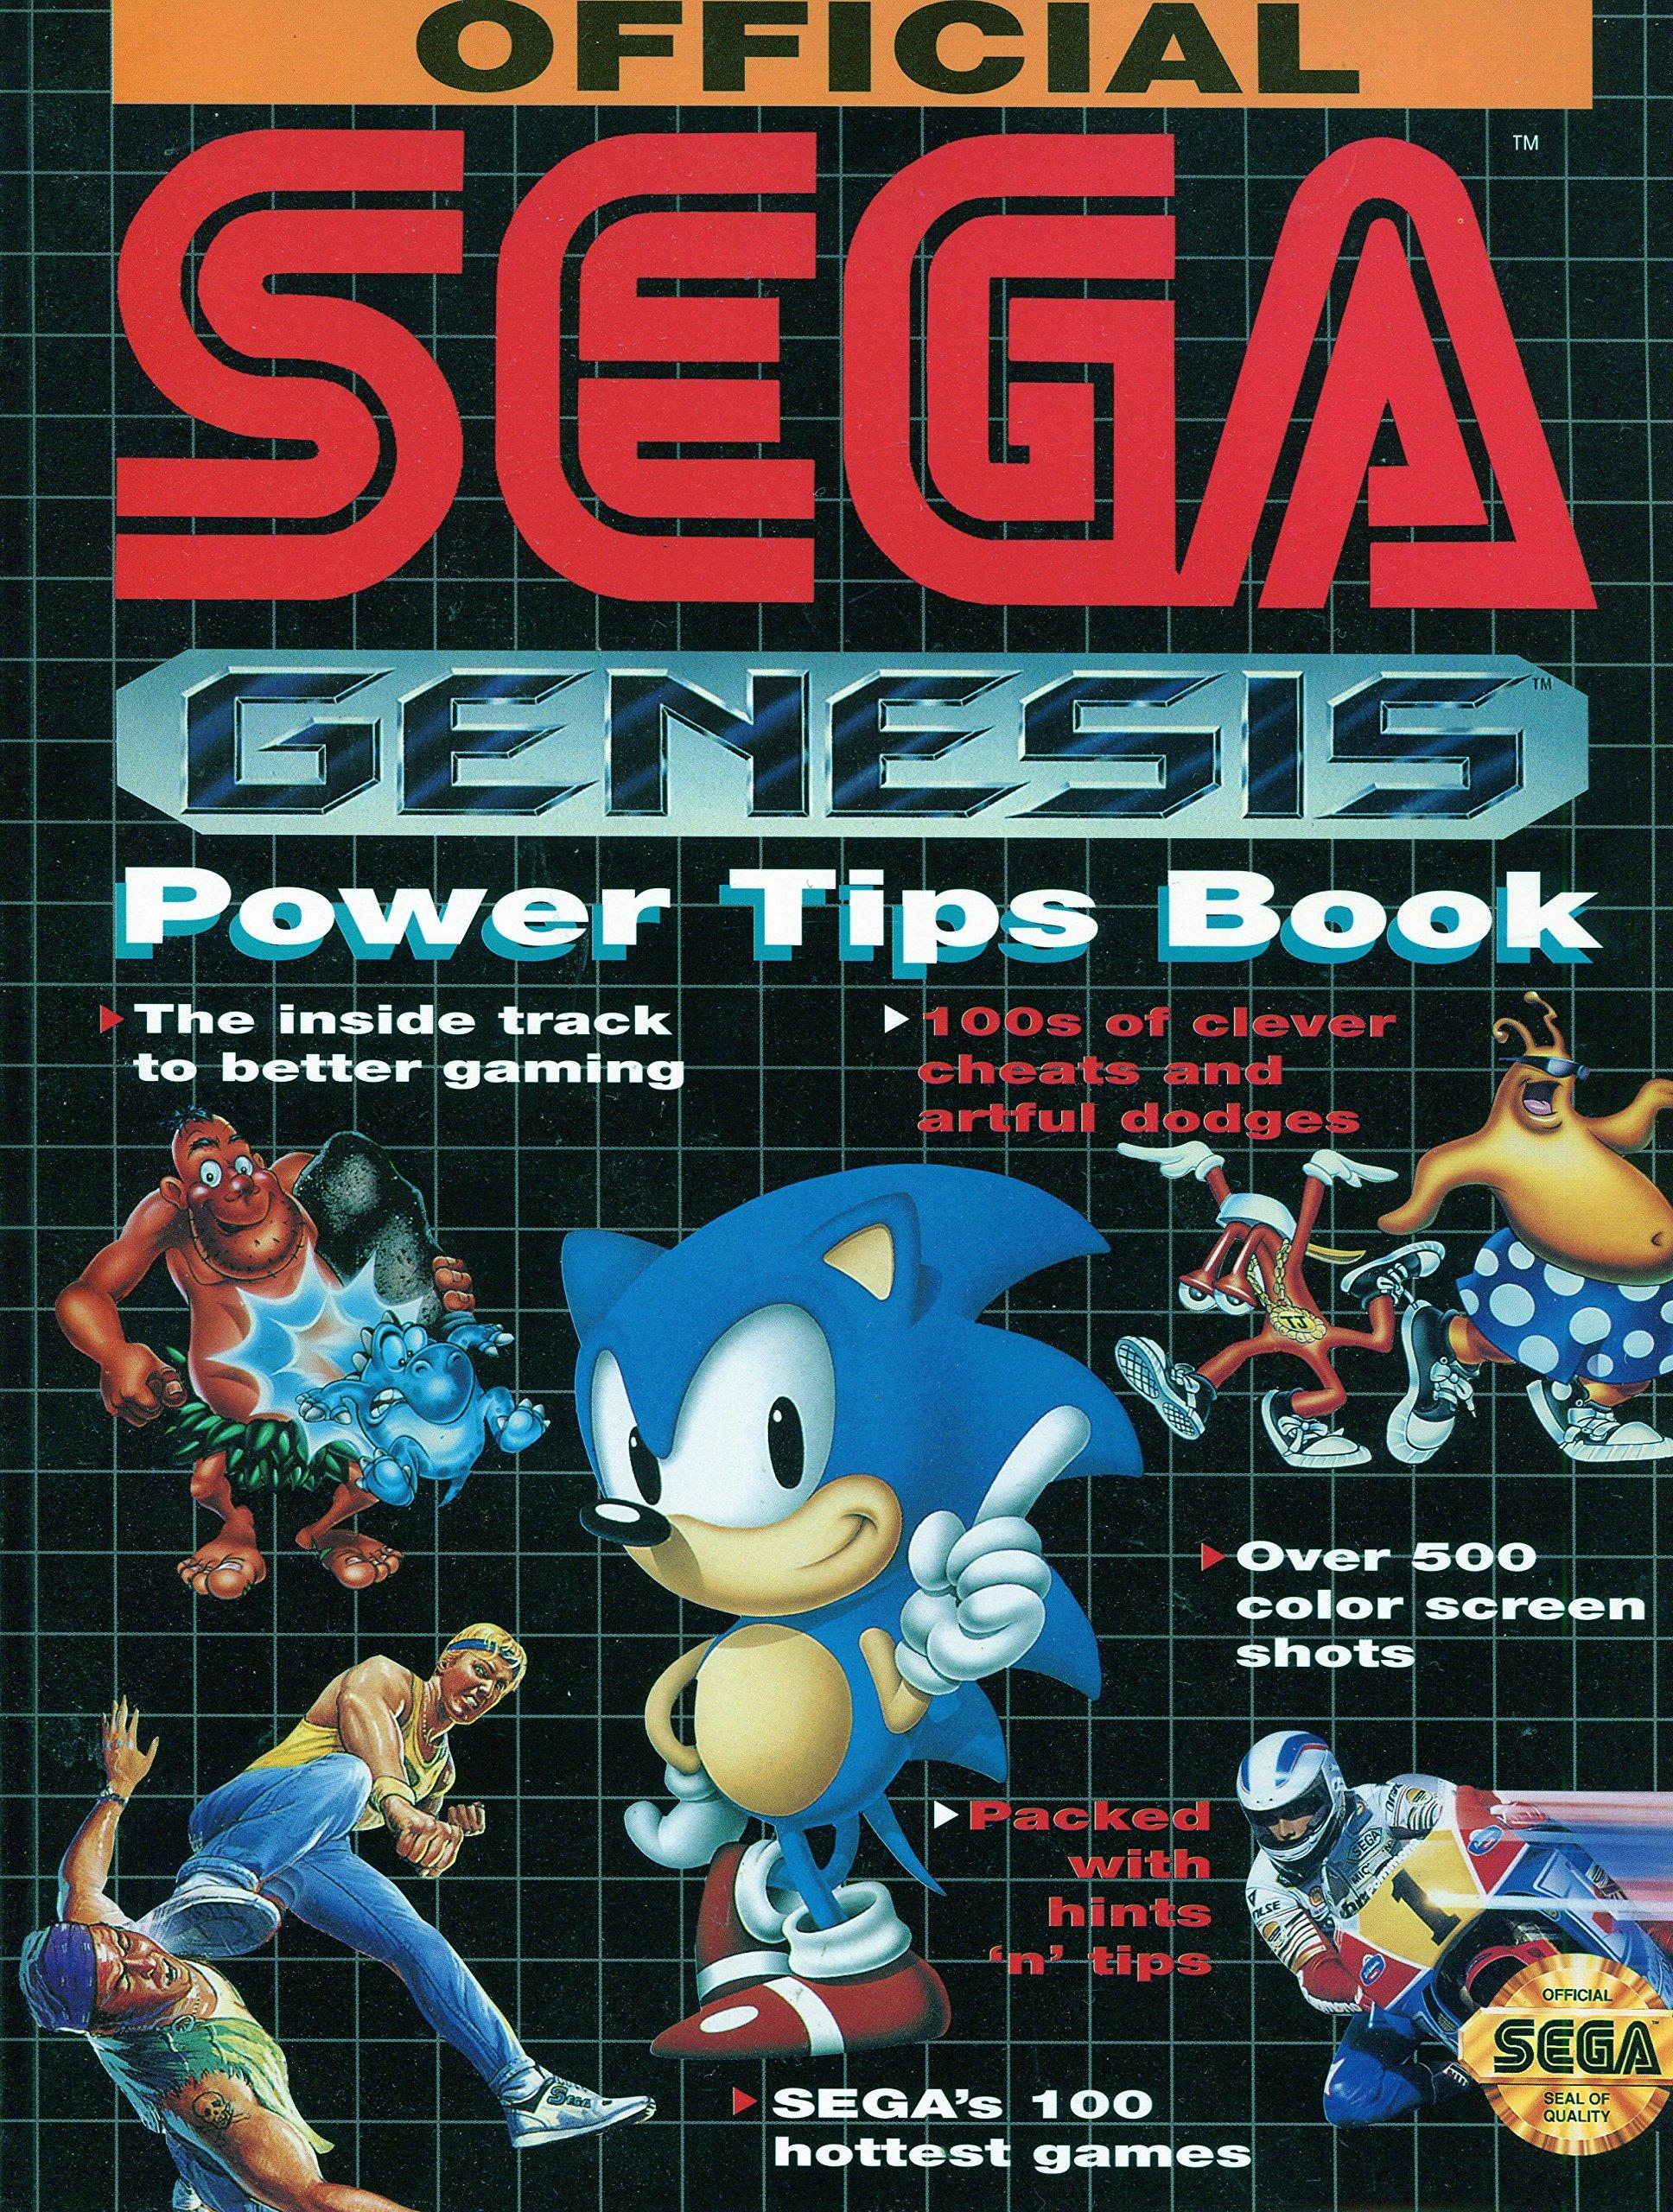 Official Sega Genesis Power Tips Book Prima 9781559582841 Amazon Com Books